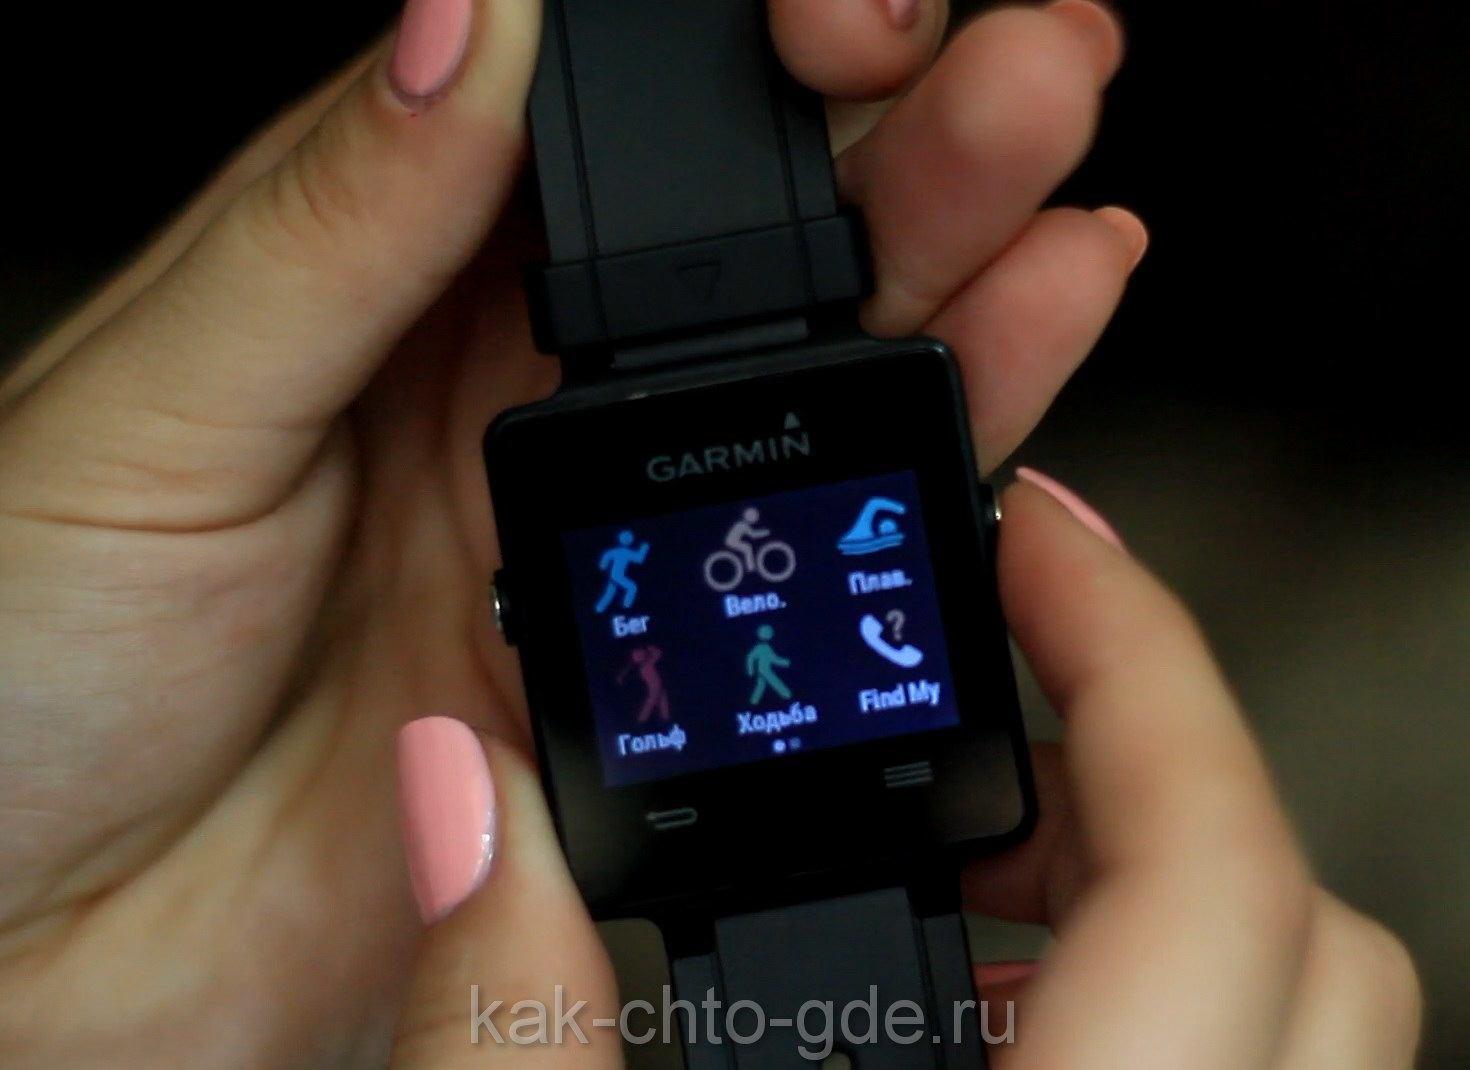 Обзор Garmin Vivoactive фото видео